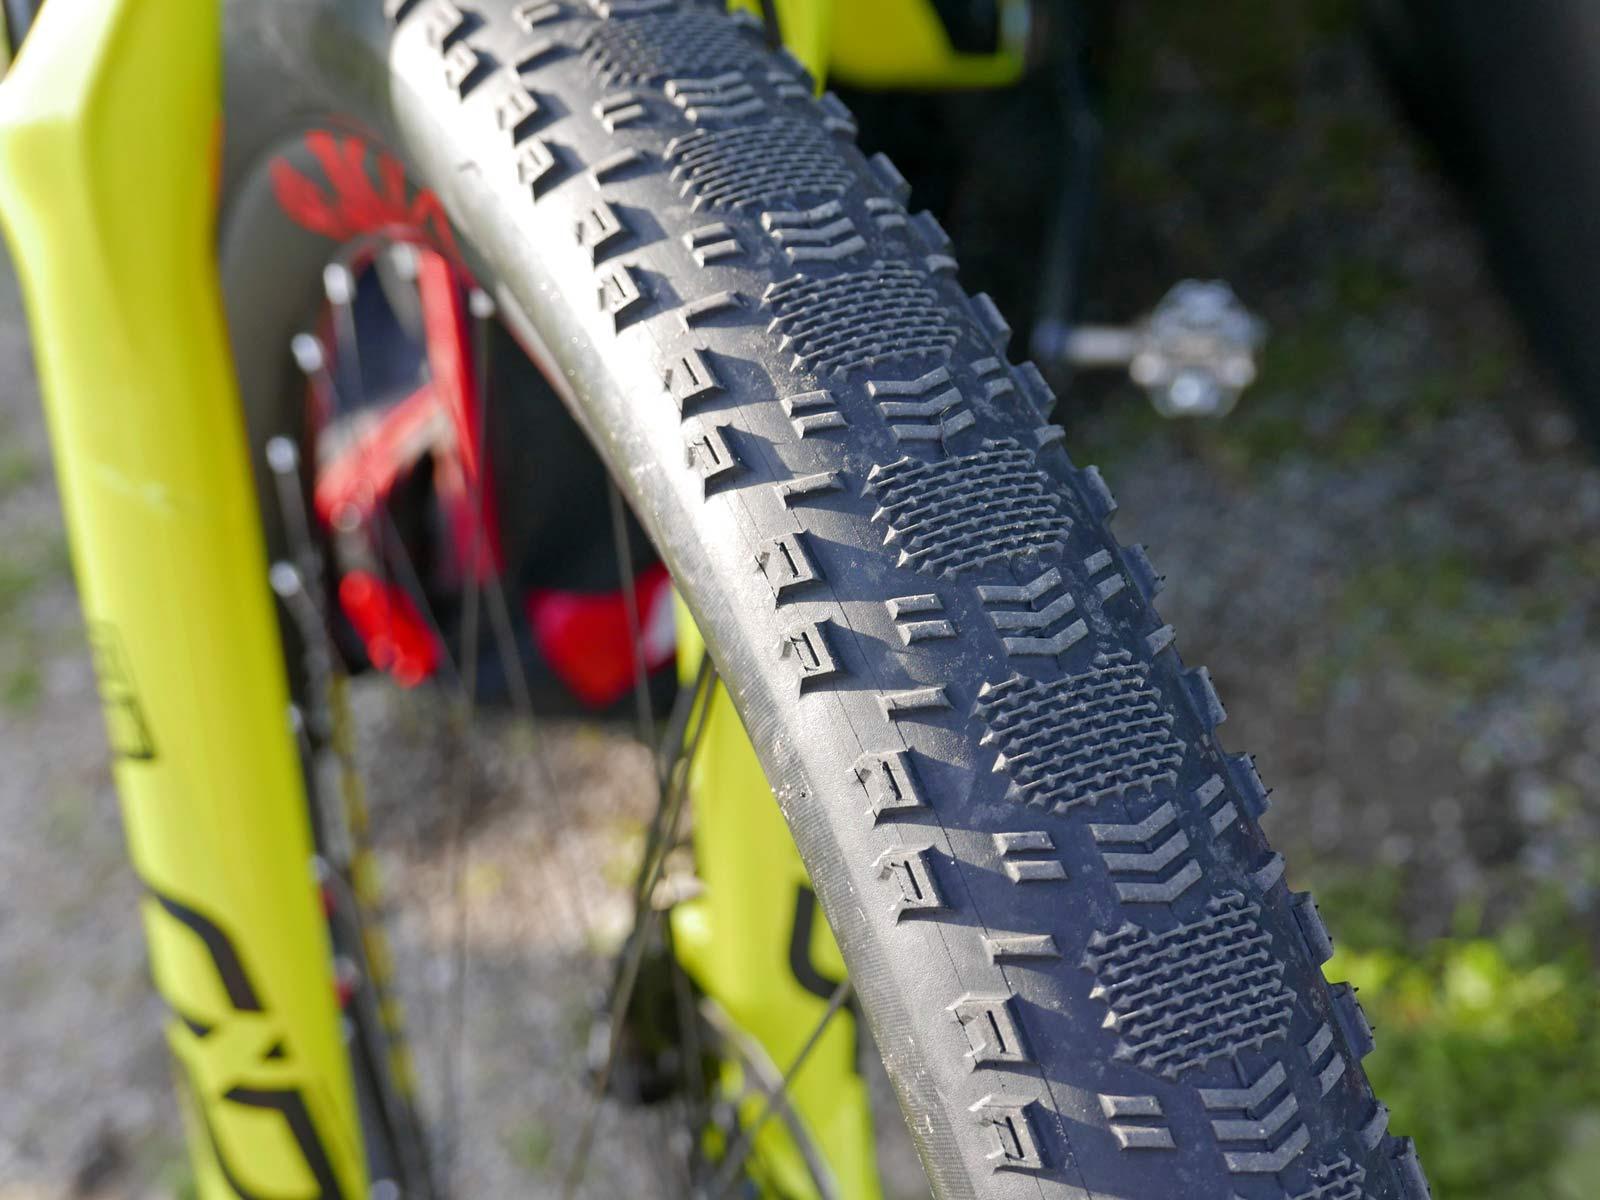 "Maxxis prototype Aspen Race semi-slick XC race tires, lightweight, fast-rolling, wide 2.4"" high-volume cross-country mountain bike tires, World Champion Nino Schurter"